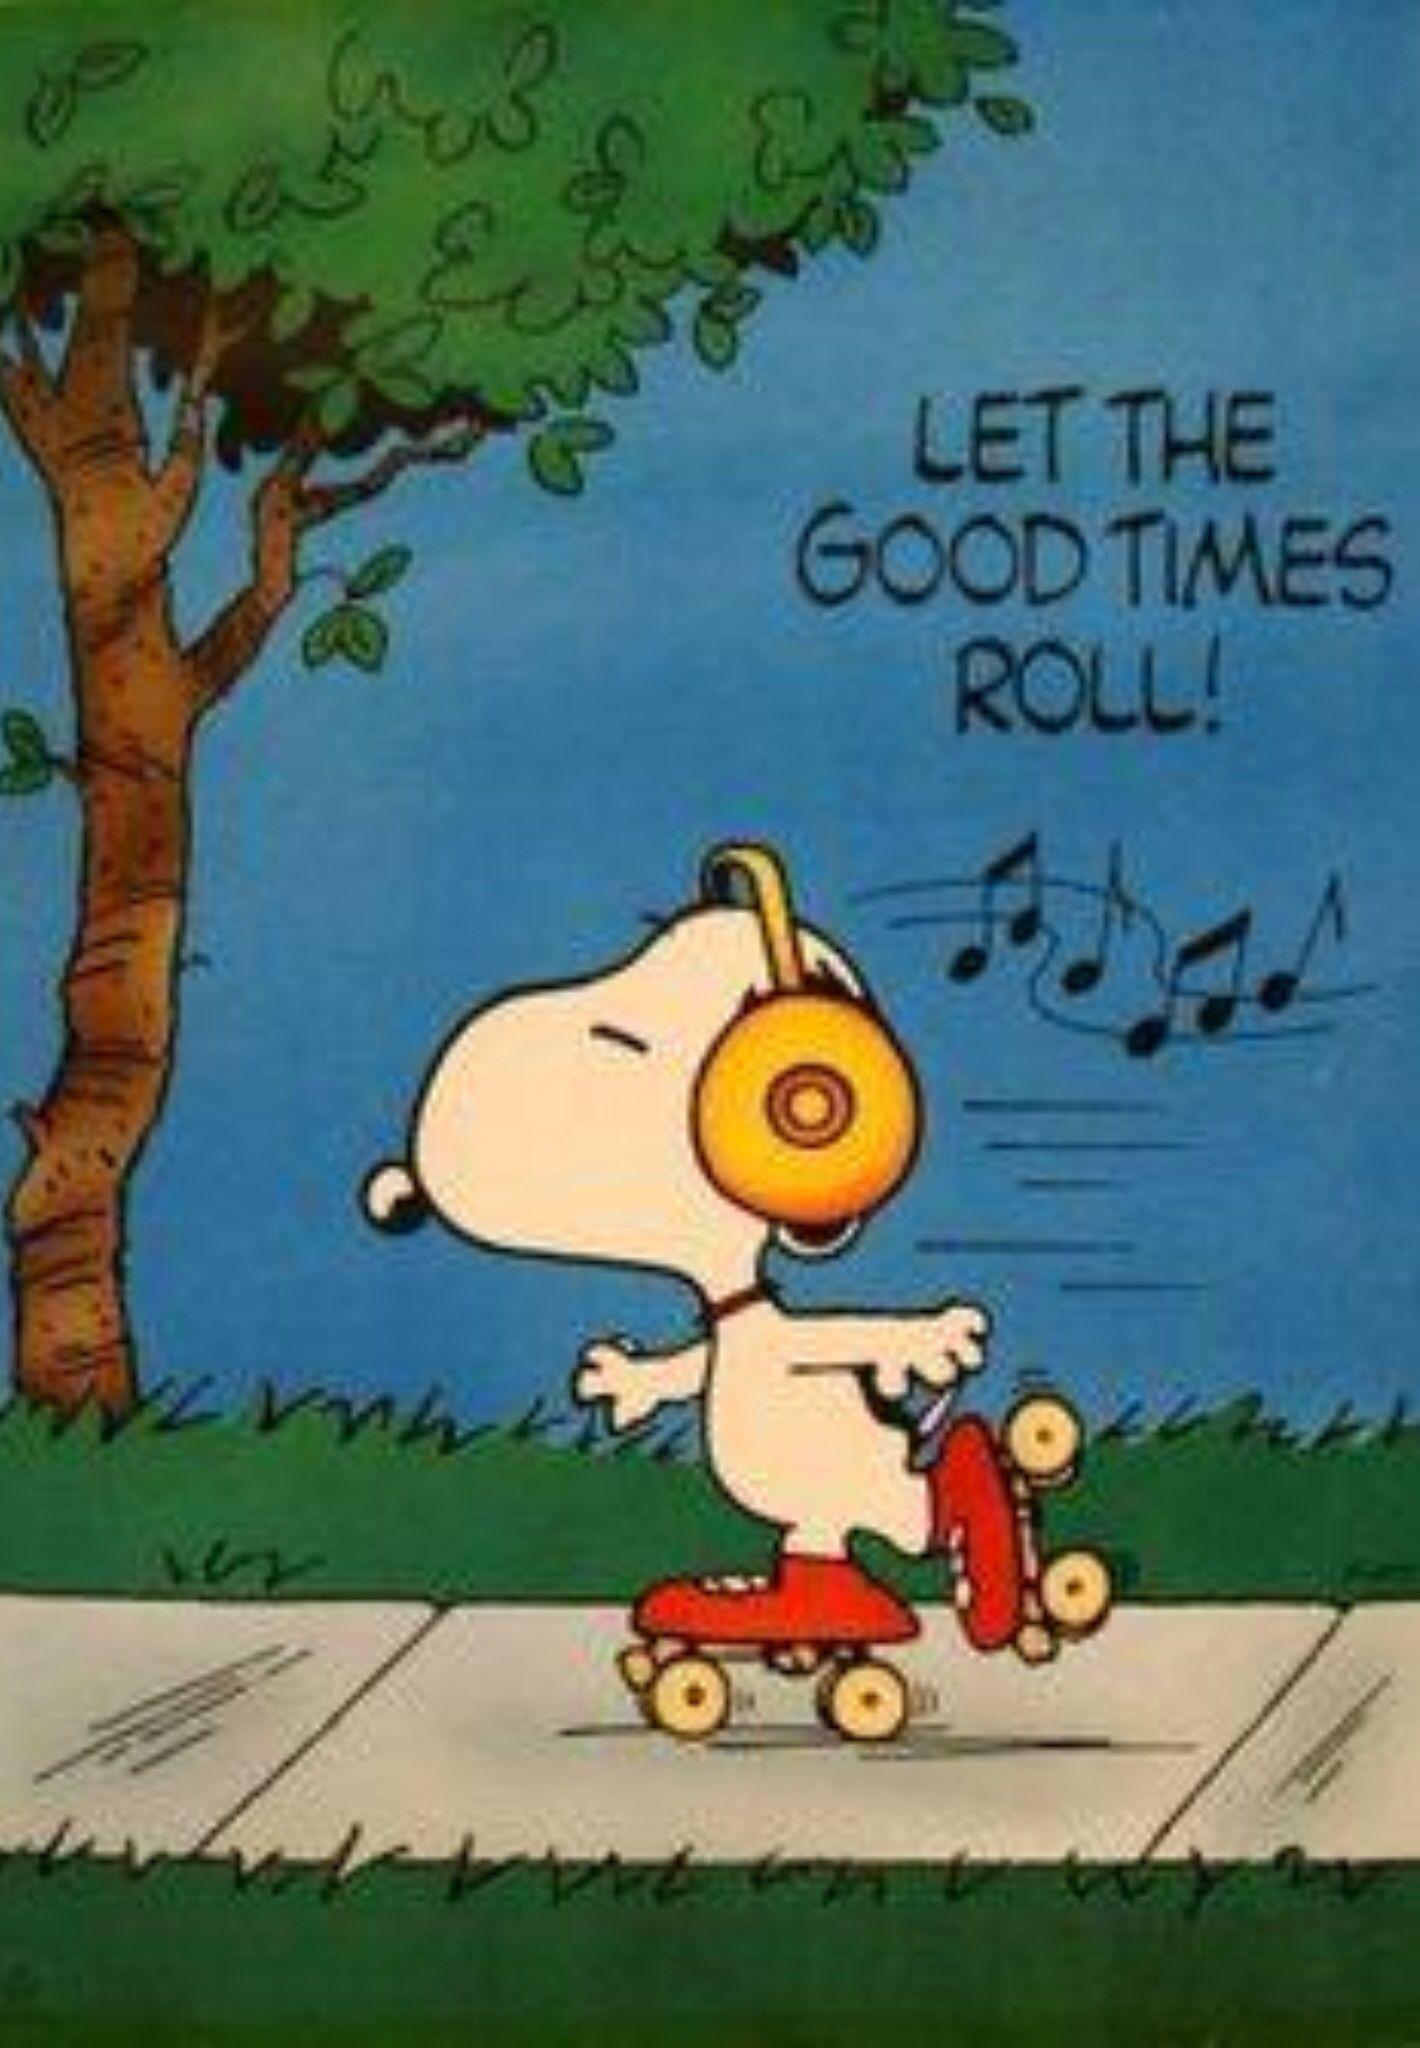 Roller skates winnipeg - Snoopy Roller Skates